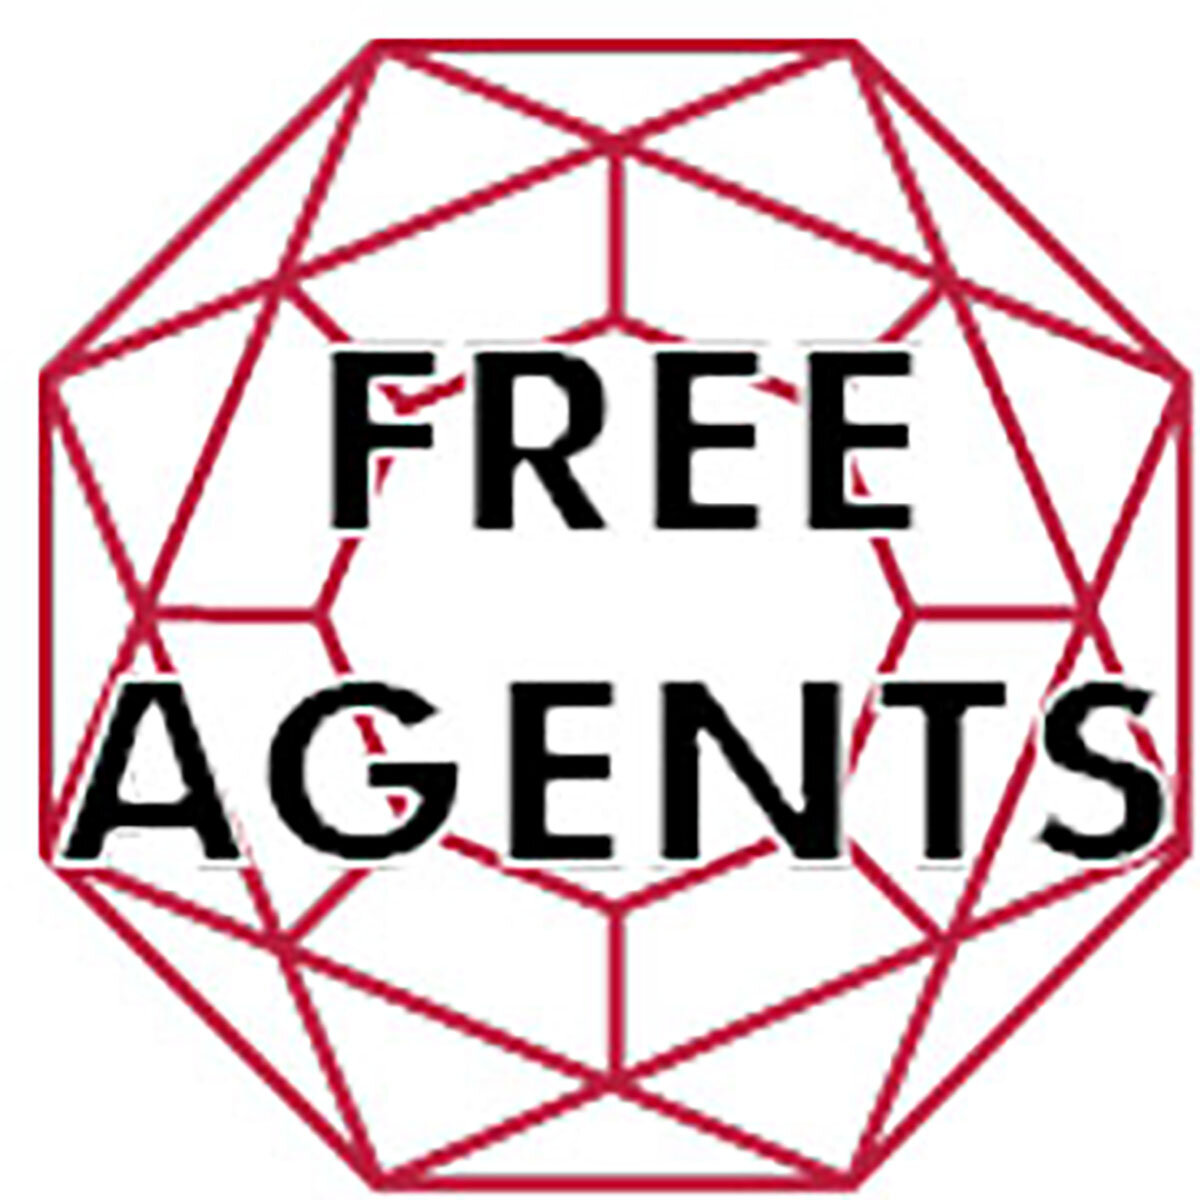 Free Agent Athletes